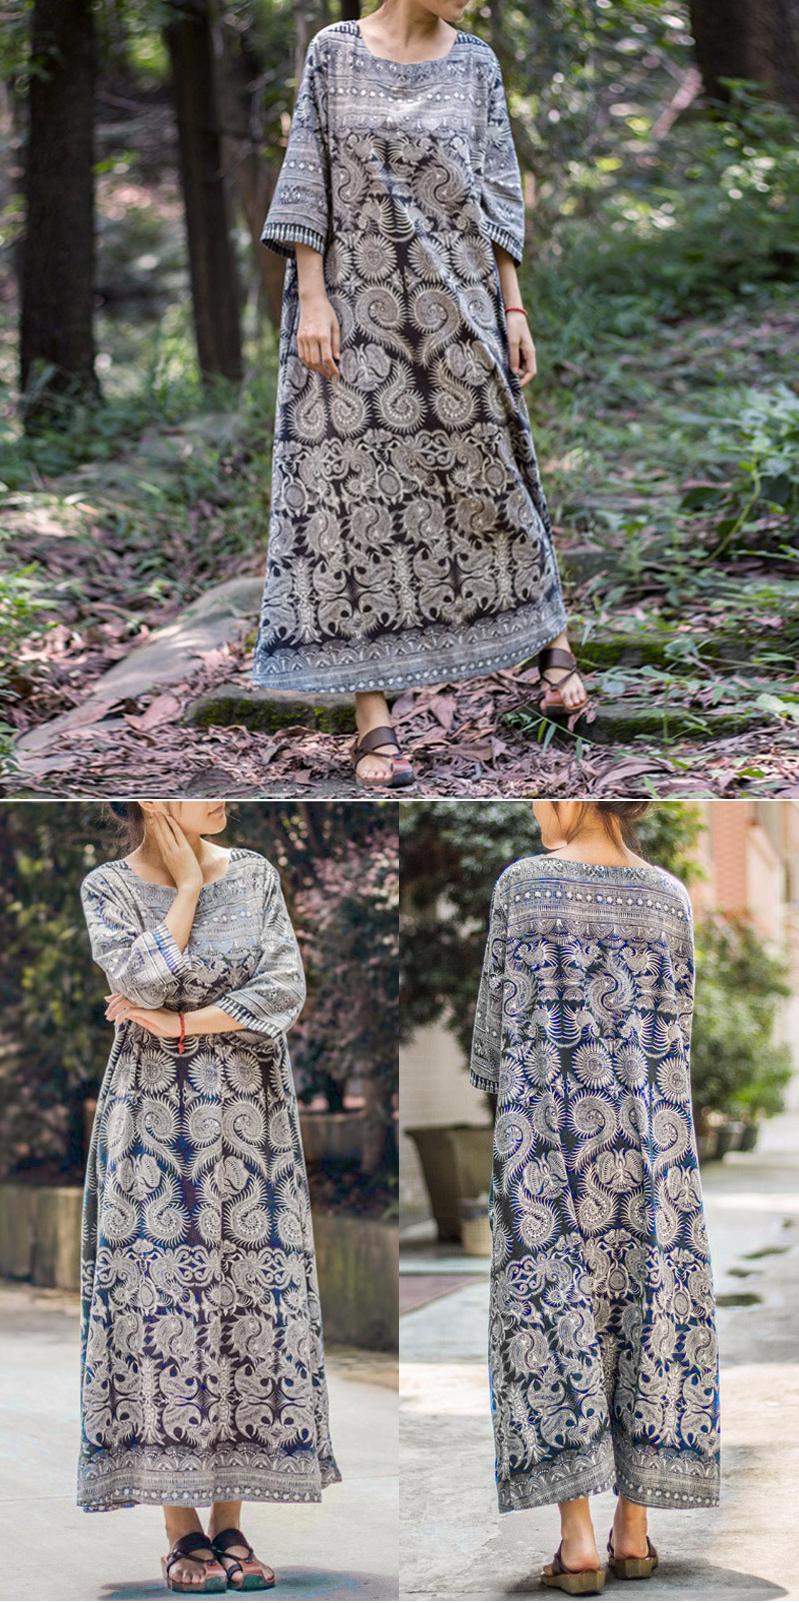 Usdress vintage sleeve ethnic printed long maxi women